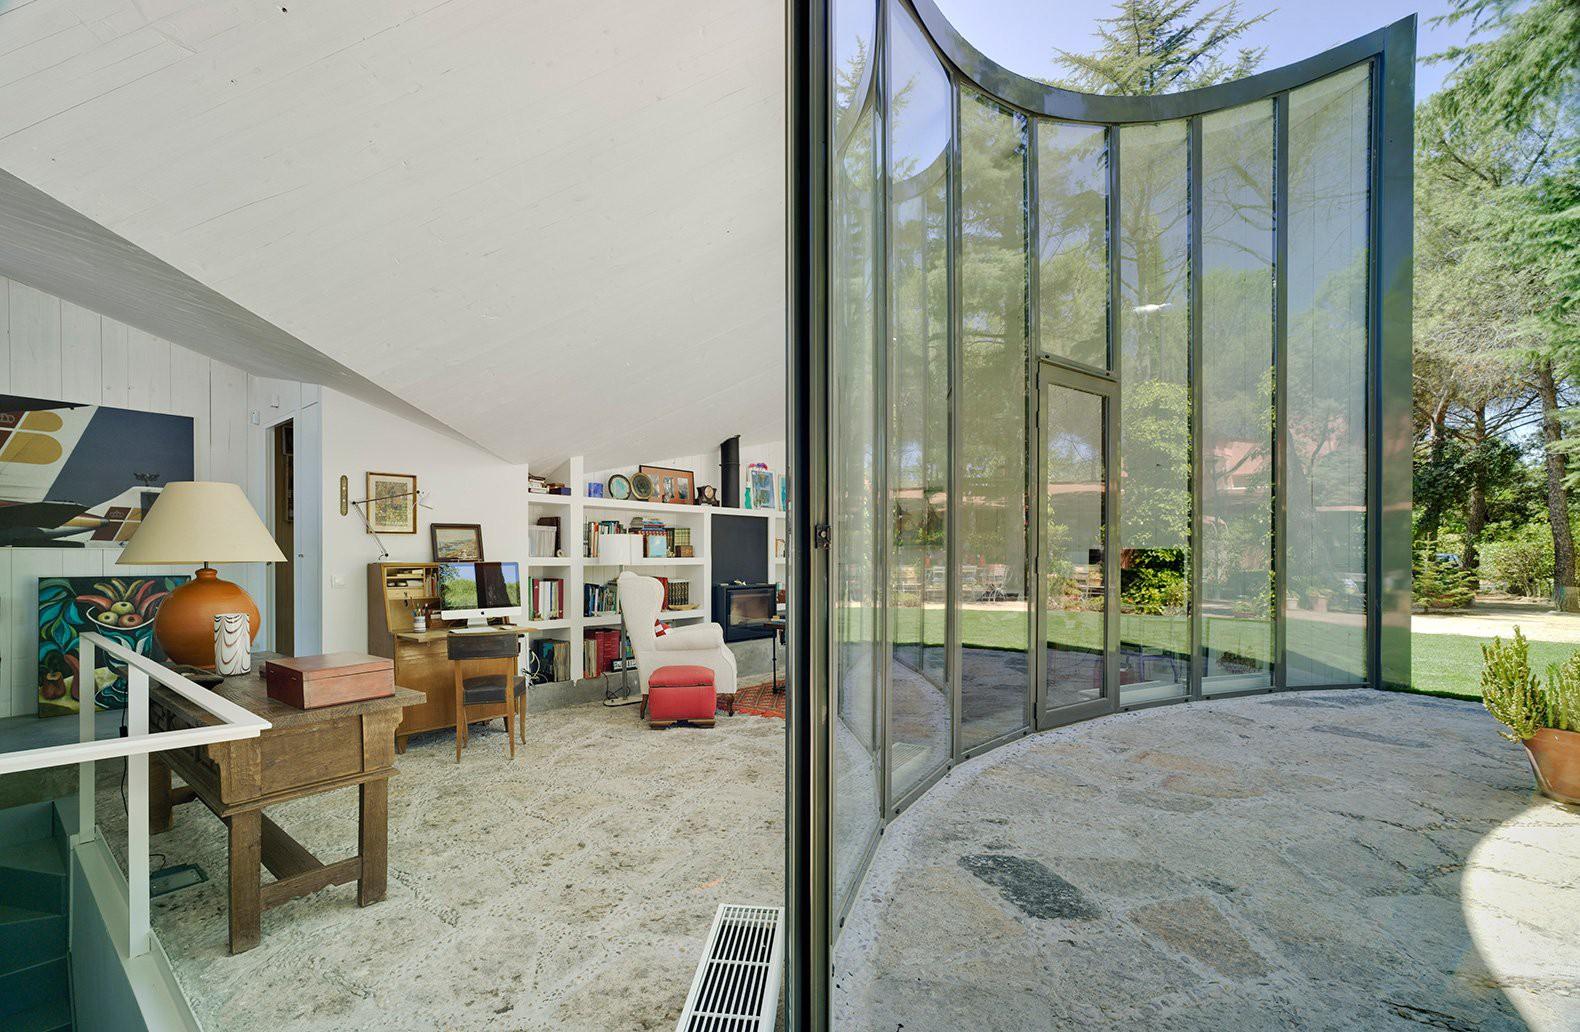 Interior e exterior da casa